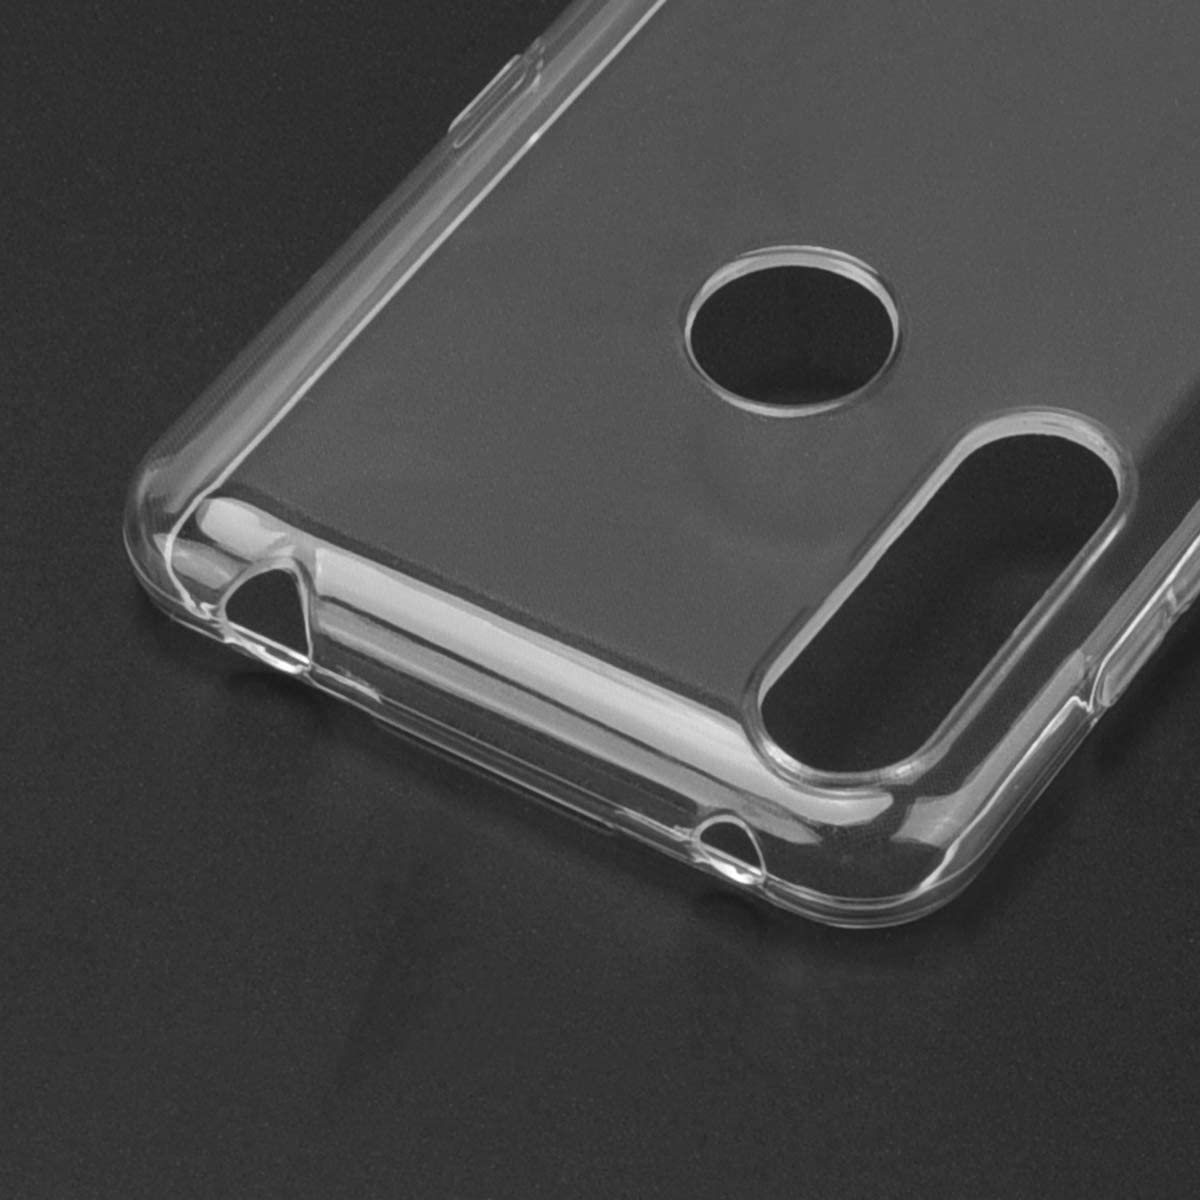 ROVLAK Funda para Alcatel 1S 2020 Silicona Case Transparente Clear Cover Ultra Delgada Ligera Antigolpes Carcasa Anti-ara/ñazos Estuche TPU Silicona Phone Case para Alcatel 1S 2020